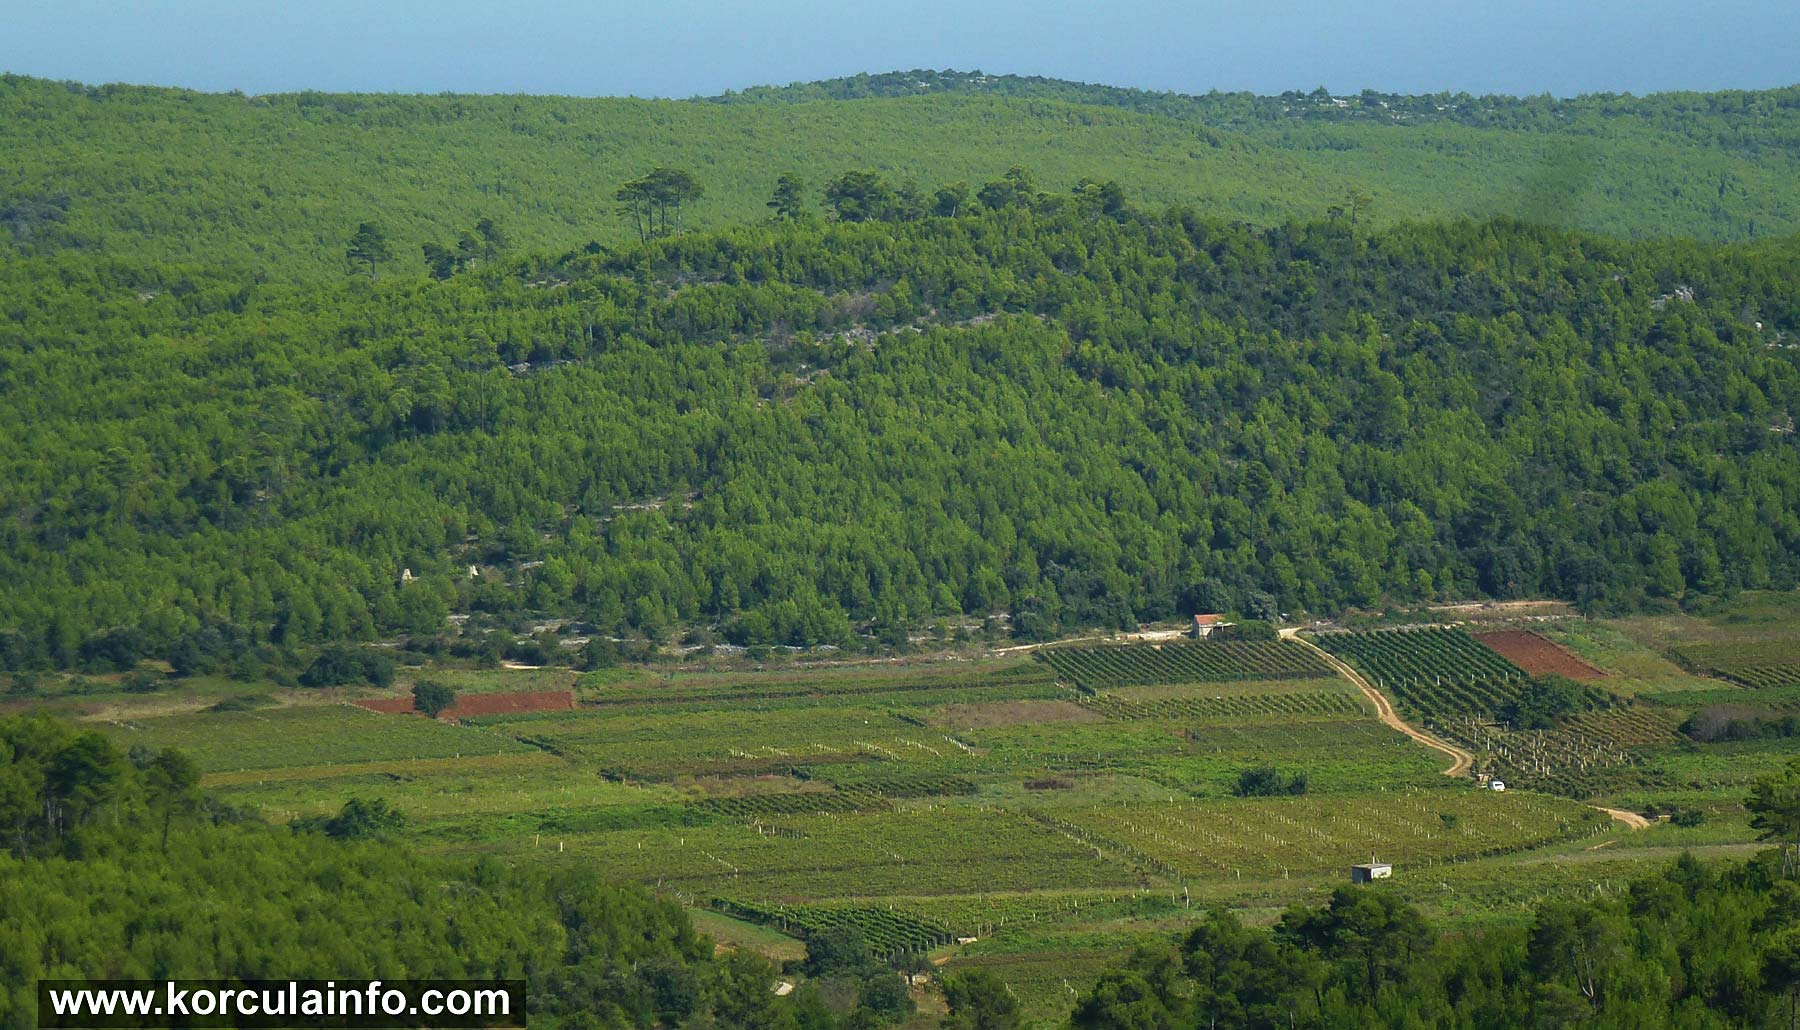 Krusevo Vineyard - Smokvica Field